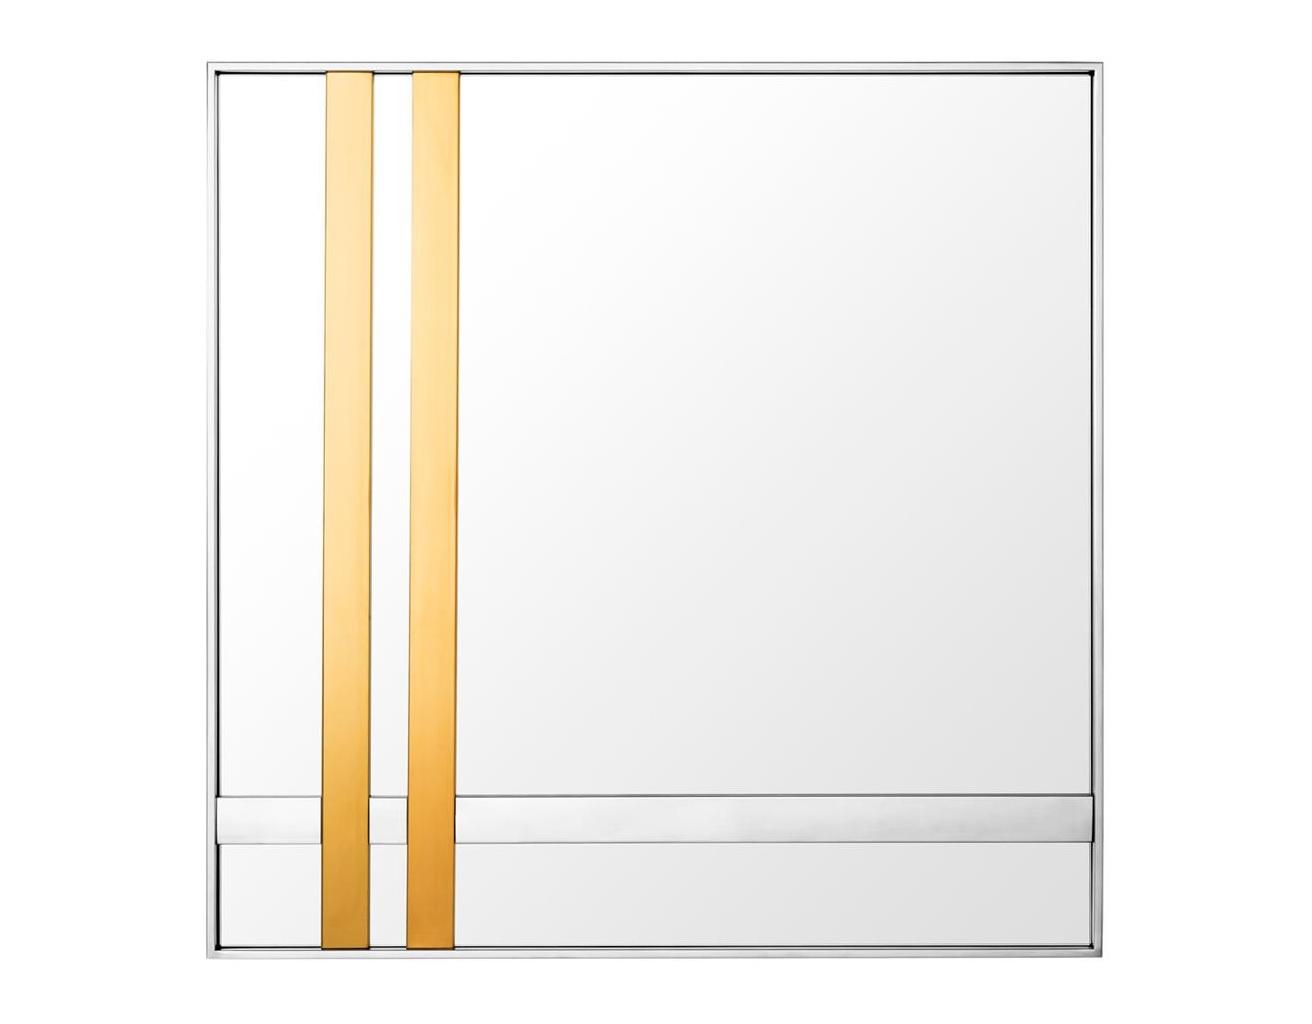 Зеркало Mirror BelgoНастенные зеркала<br><br><br>Material: Сталь<br>Ширина см: 94.0<br>Высота см: 94.0